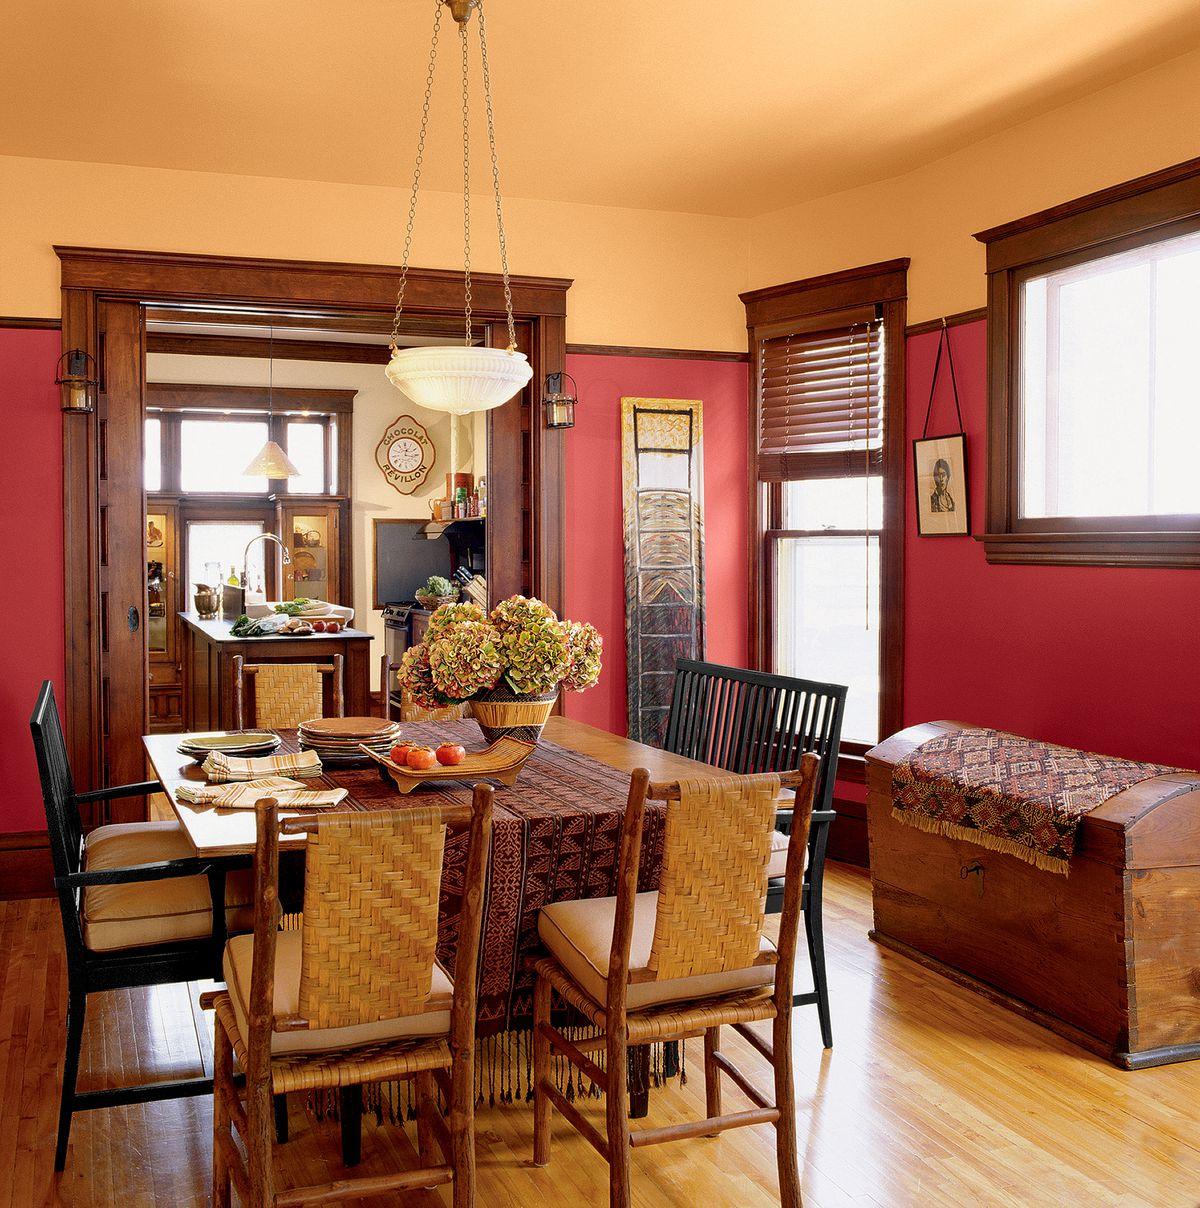 Craftsman House With Warm Tones Interior